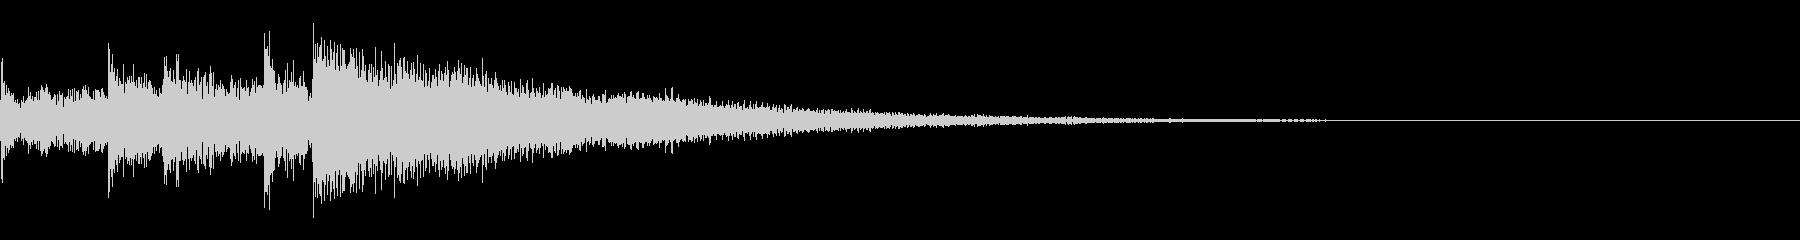 Handpan / Tap / Notification / Notification 19's unreproduced waveform